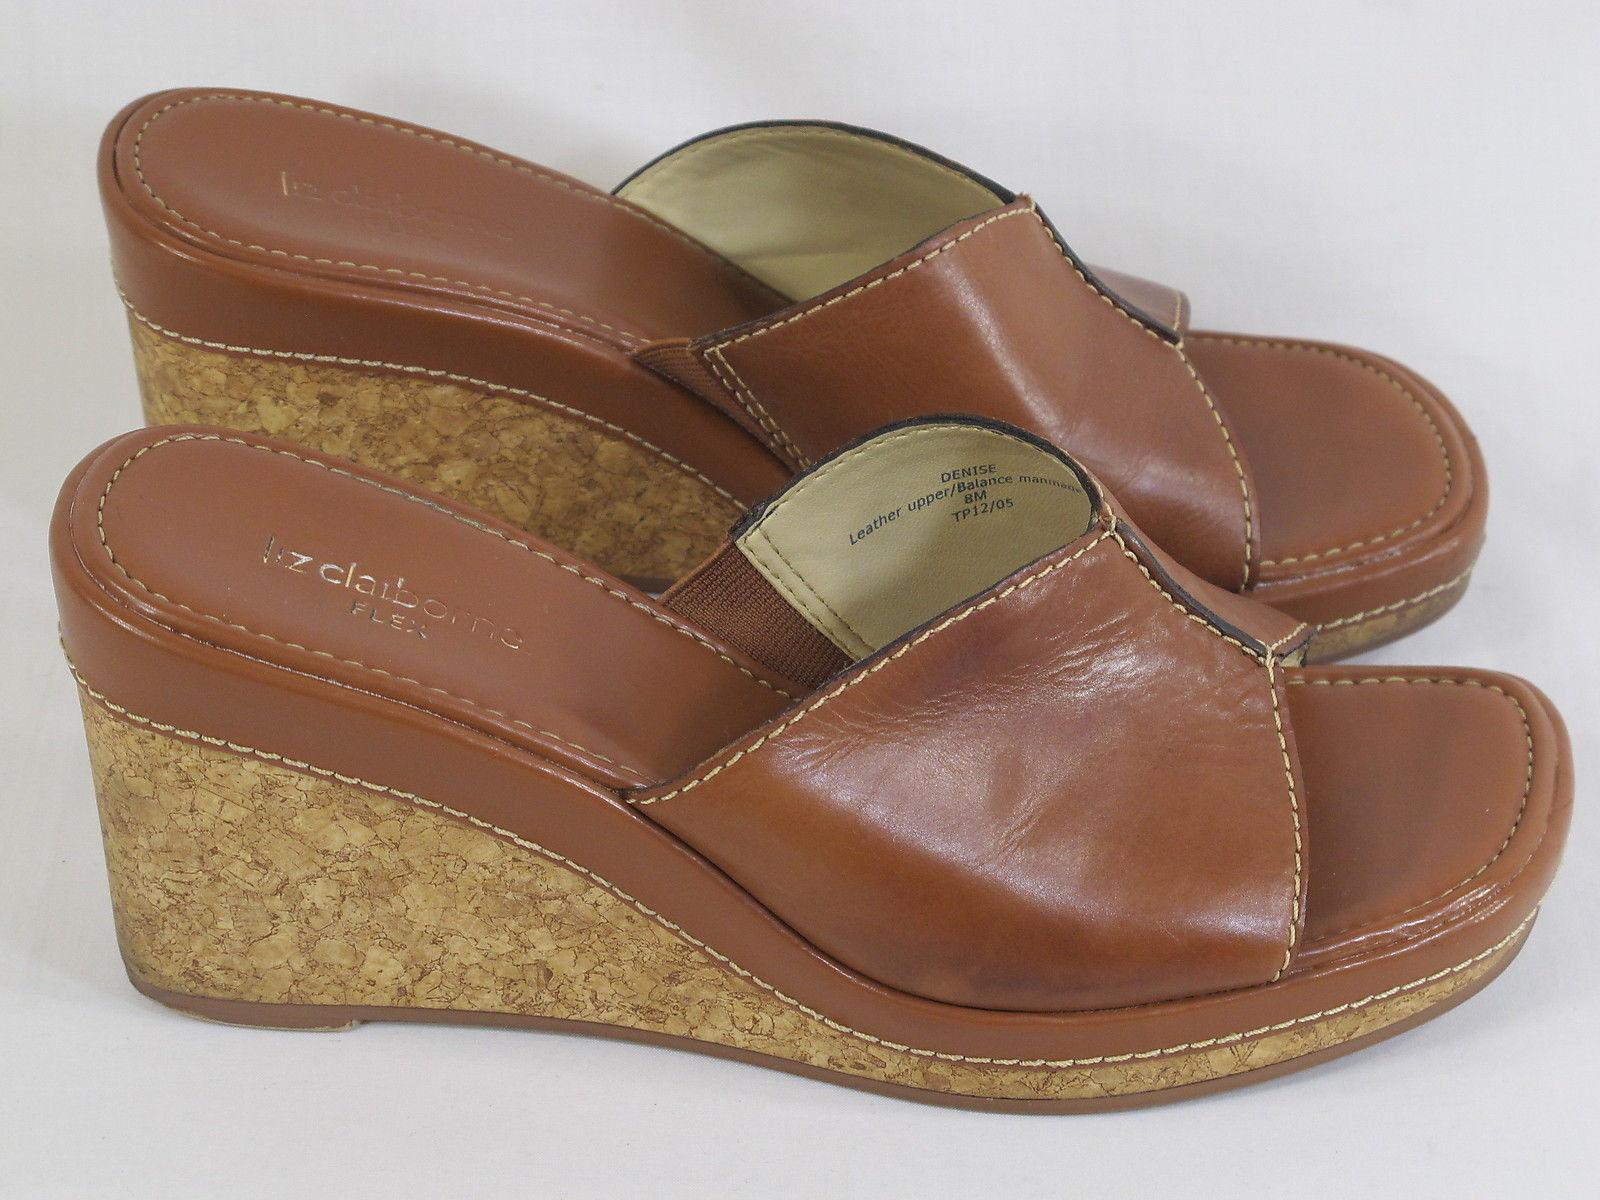 314bcff6941 57. 57. Liz Claiborne Flex Brown Leather Open Toe Wedge Mules 8 M US  Excellent. Liz Claiborne Flex Brown Leather Open ...